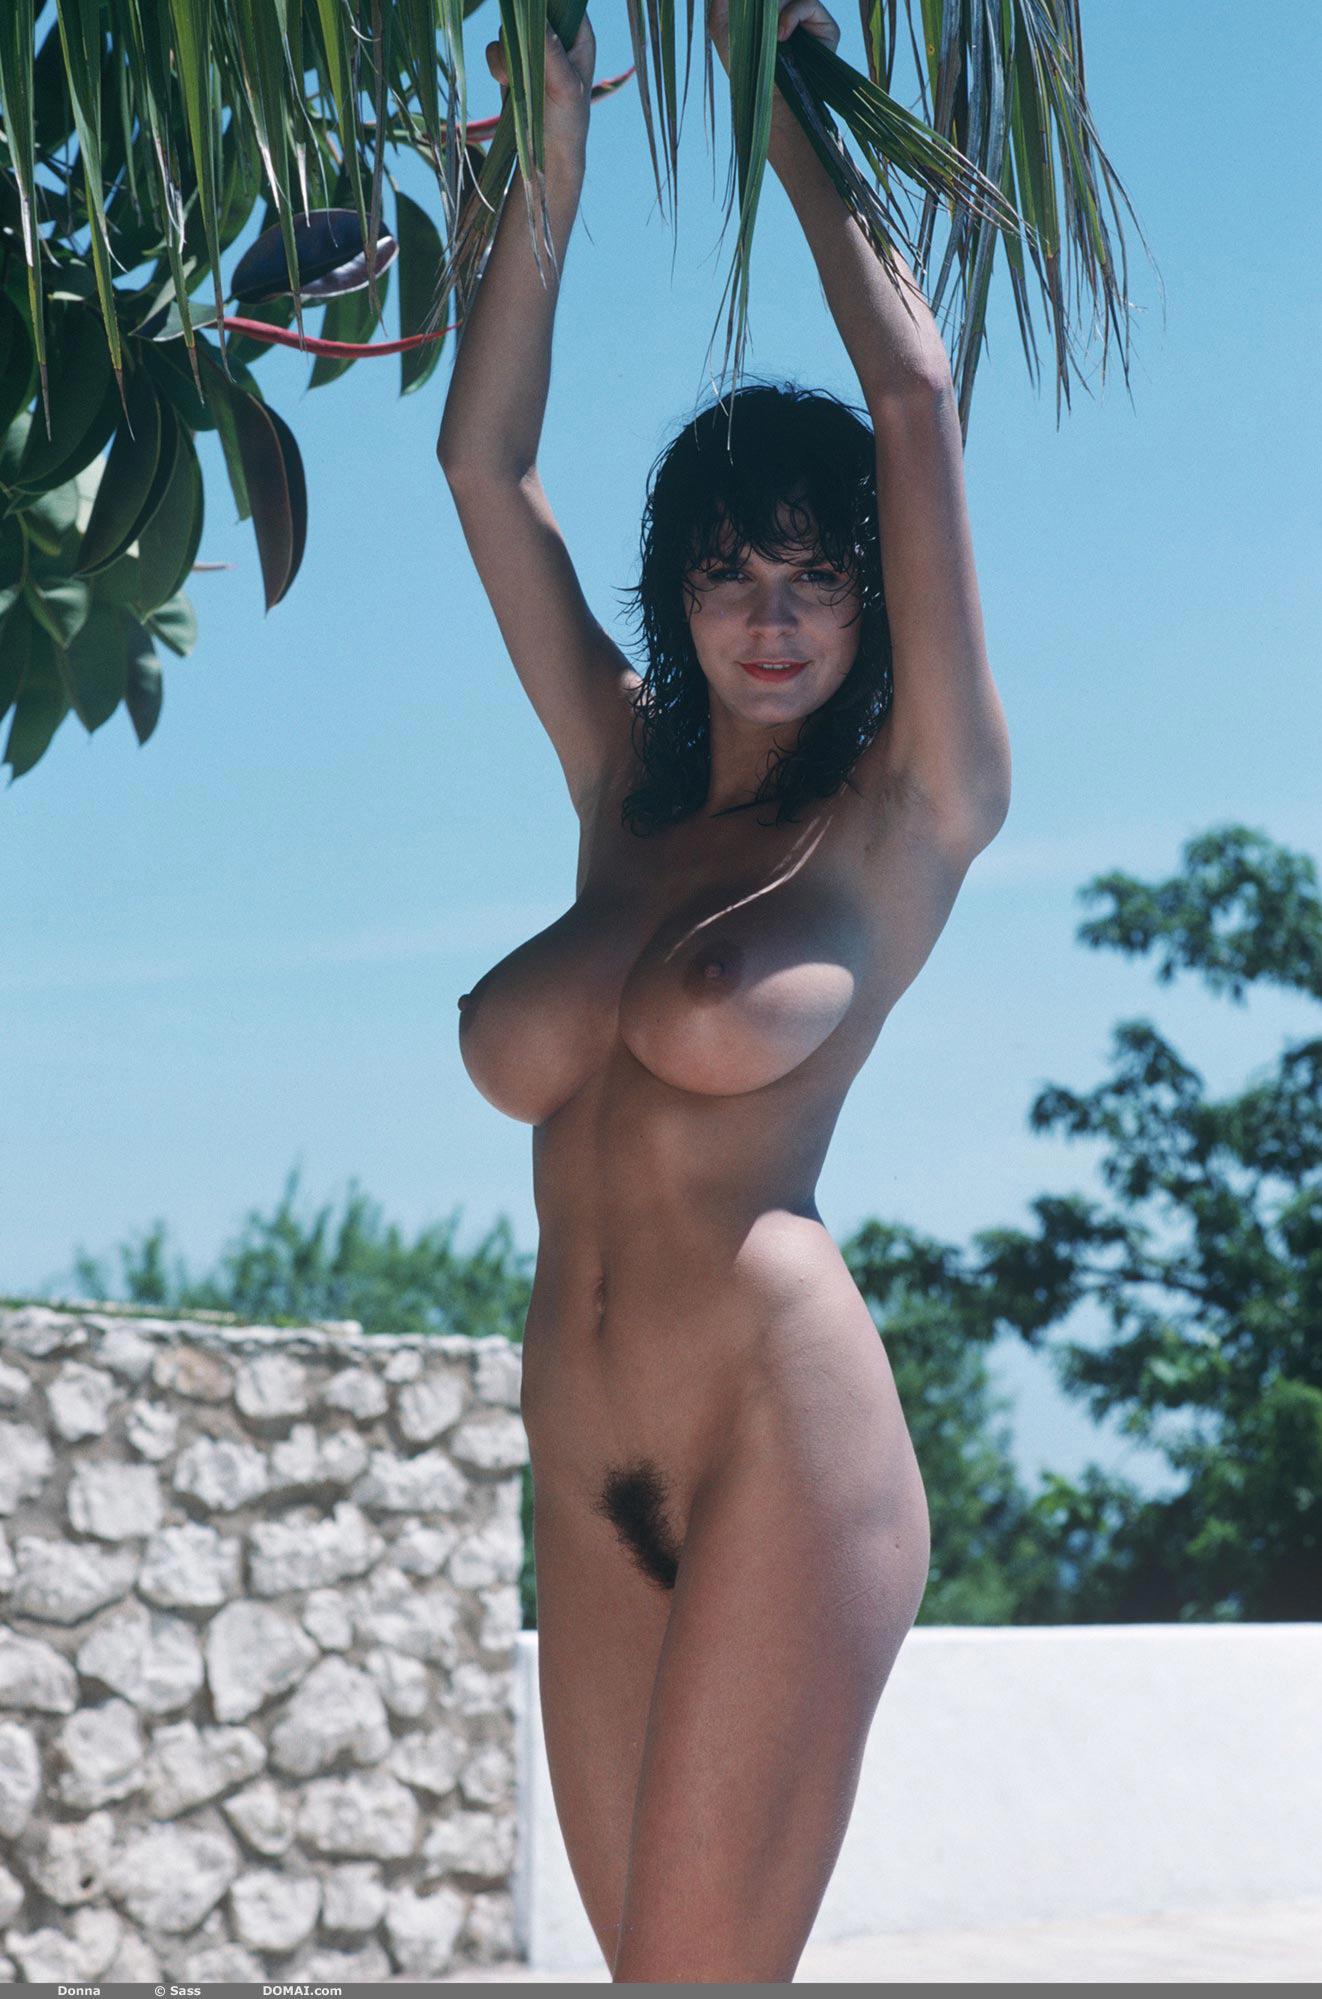 Jessie spano boobs